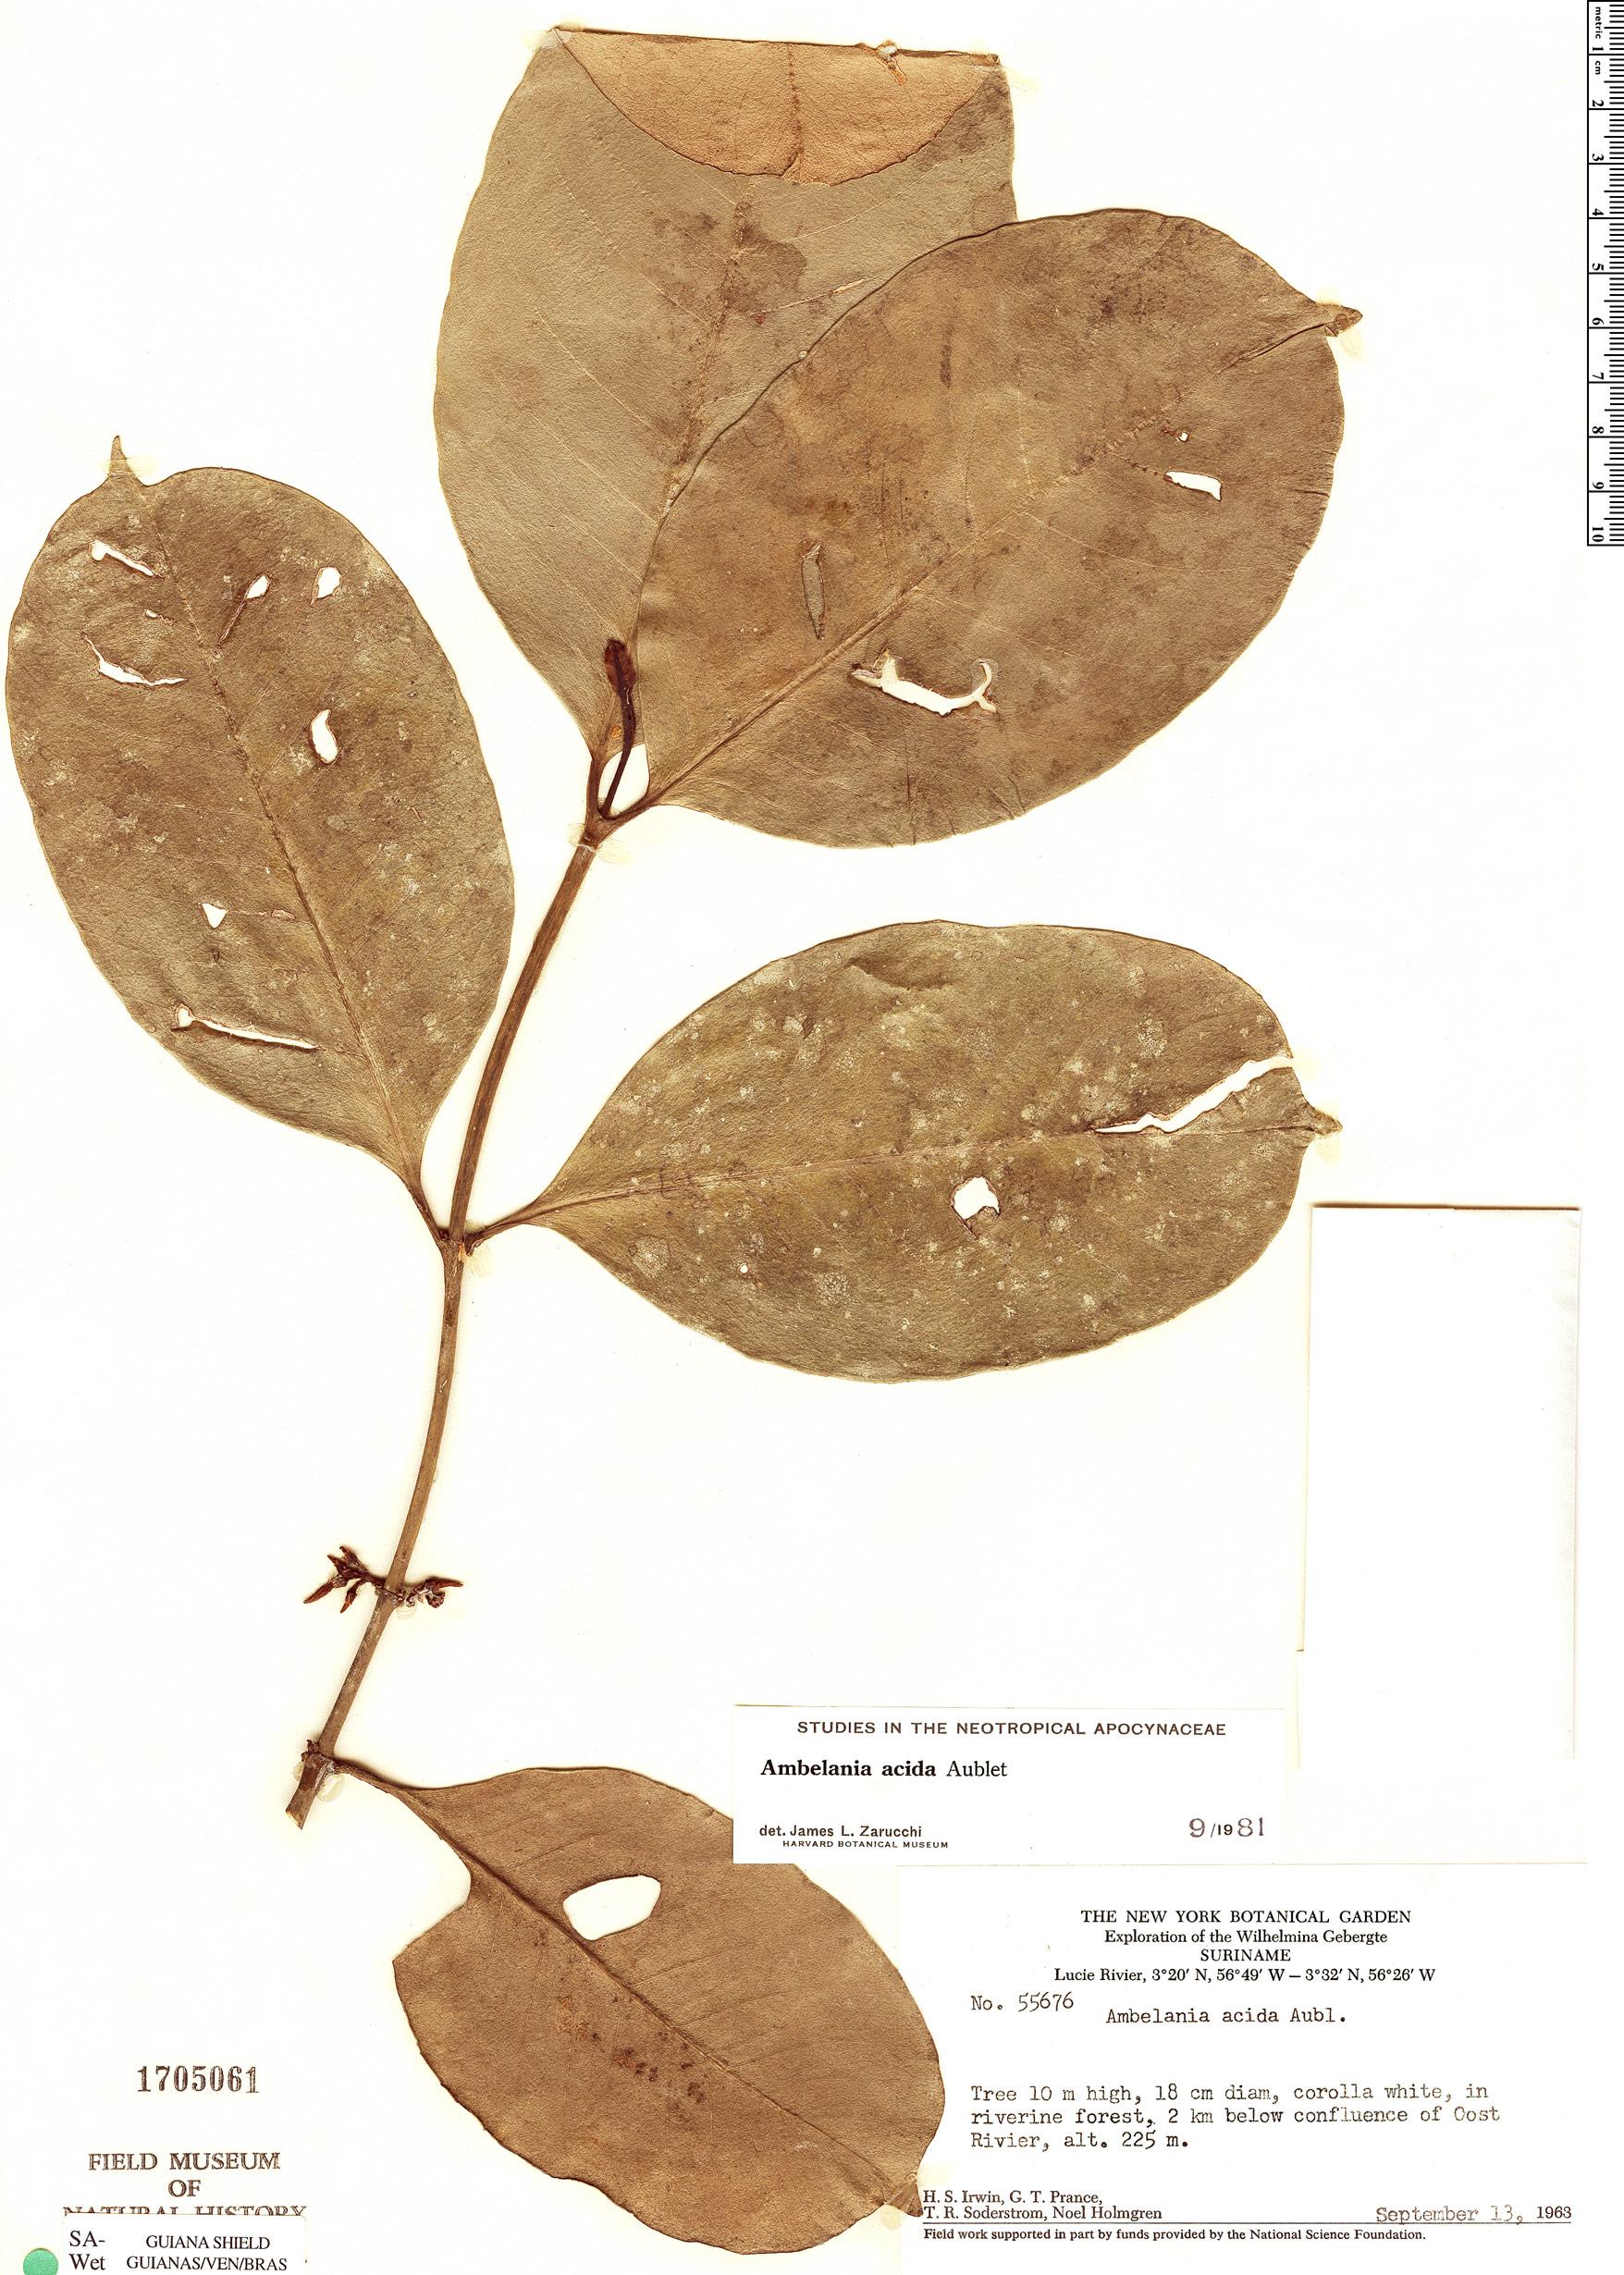 Specimen: Ambelania acida